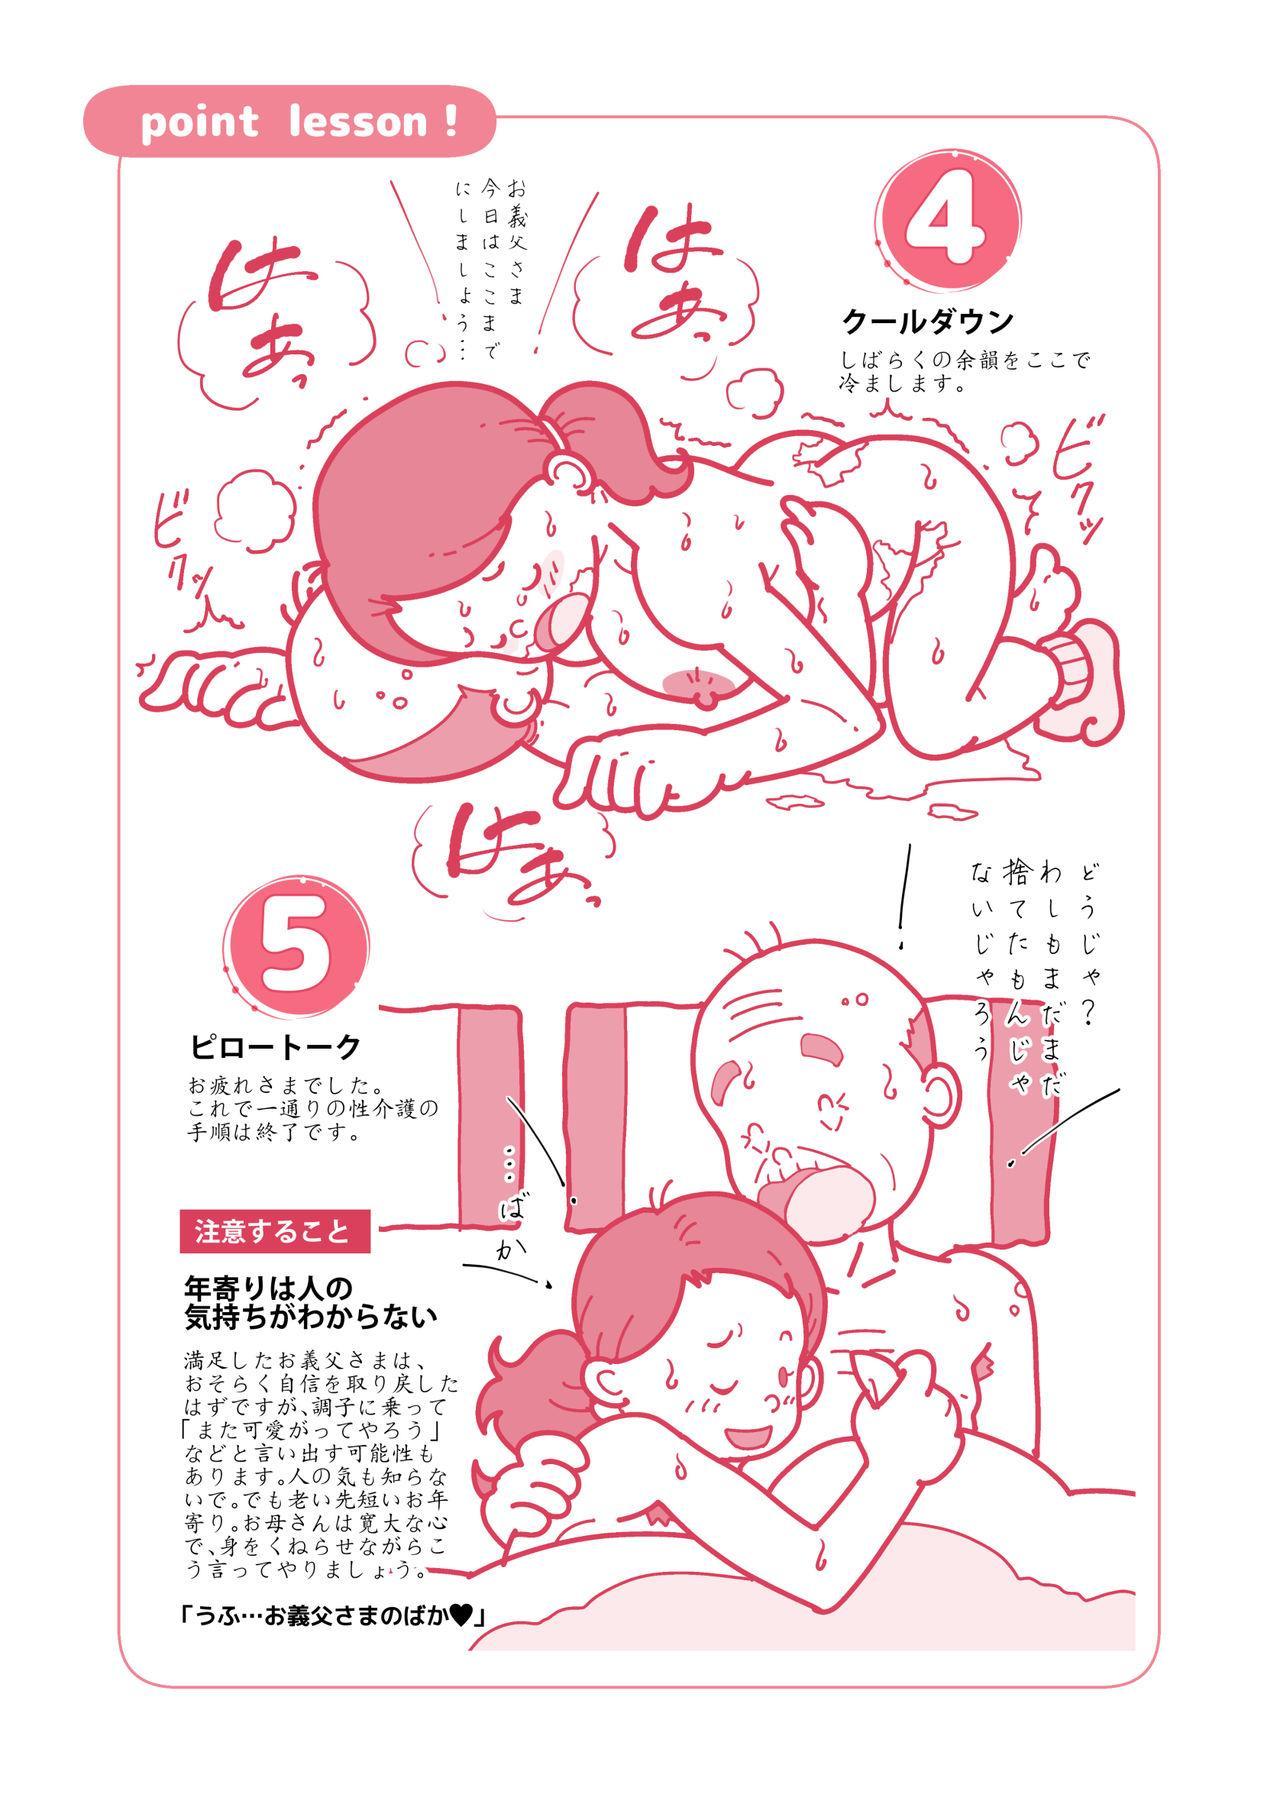 Isogasii Okaasan No Tamuno Sasa Rouzin Seikaigo | Guide for Elderly Sex Health Care to Busy Mom 62